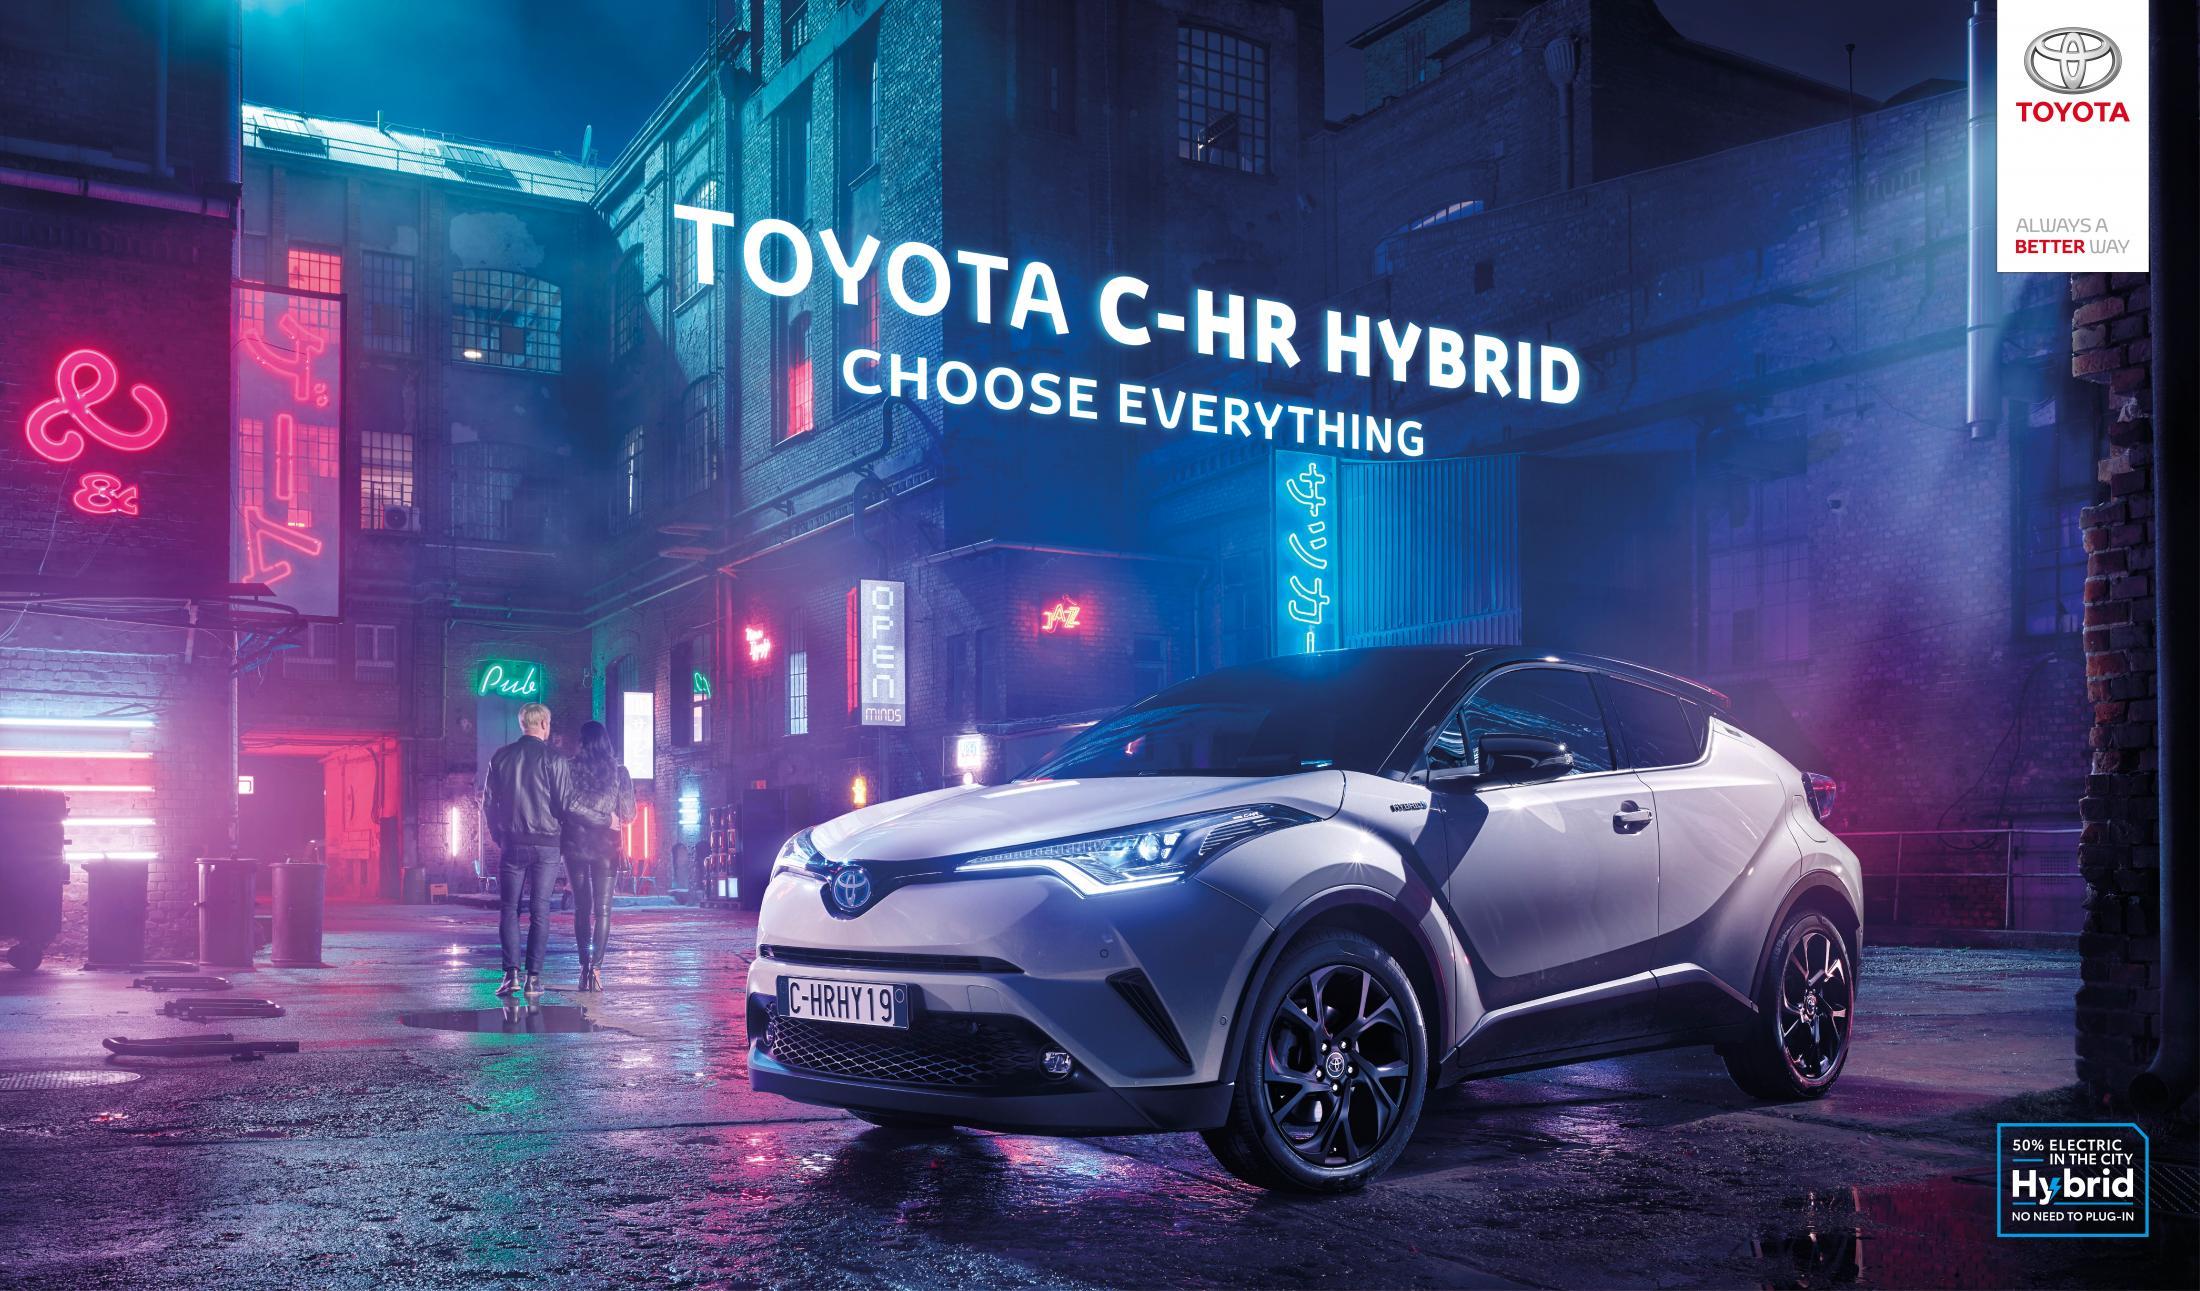 Toyota Print Ad - Choose Everything - Tokyo